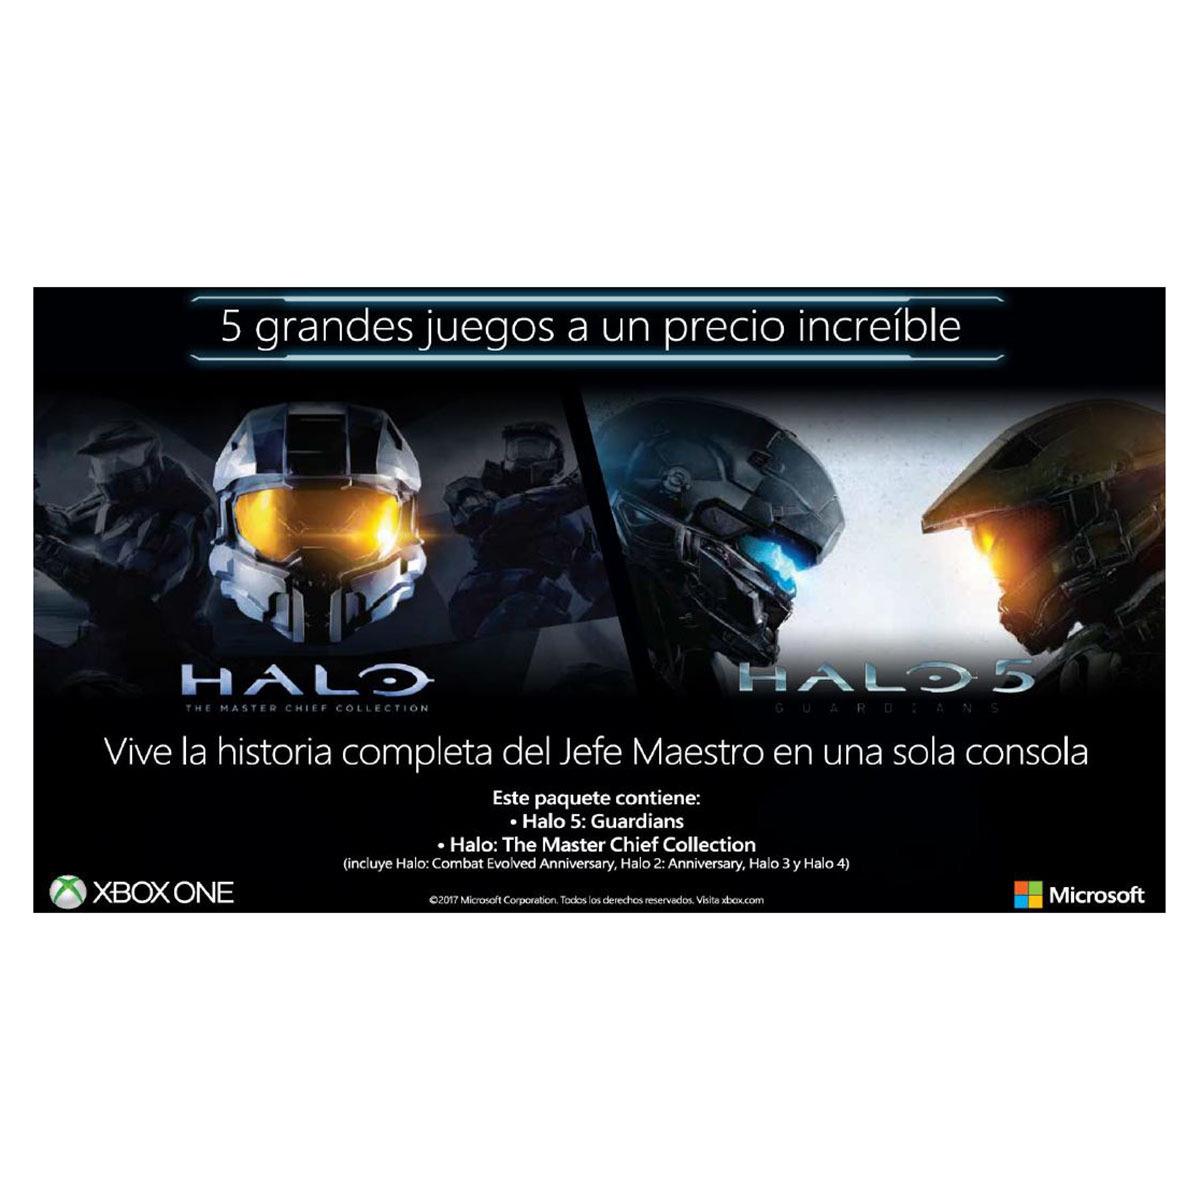 Chedraui: Halo 5 + Halo Master Chief Xbox One Microsoft (halo1,2,3,4)